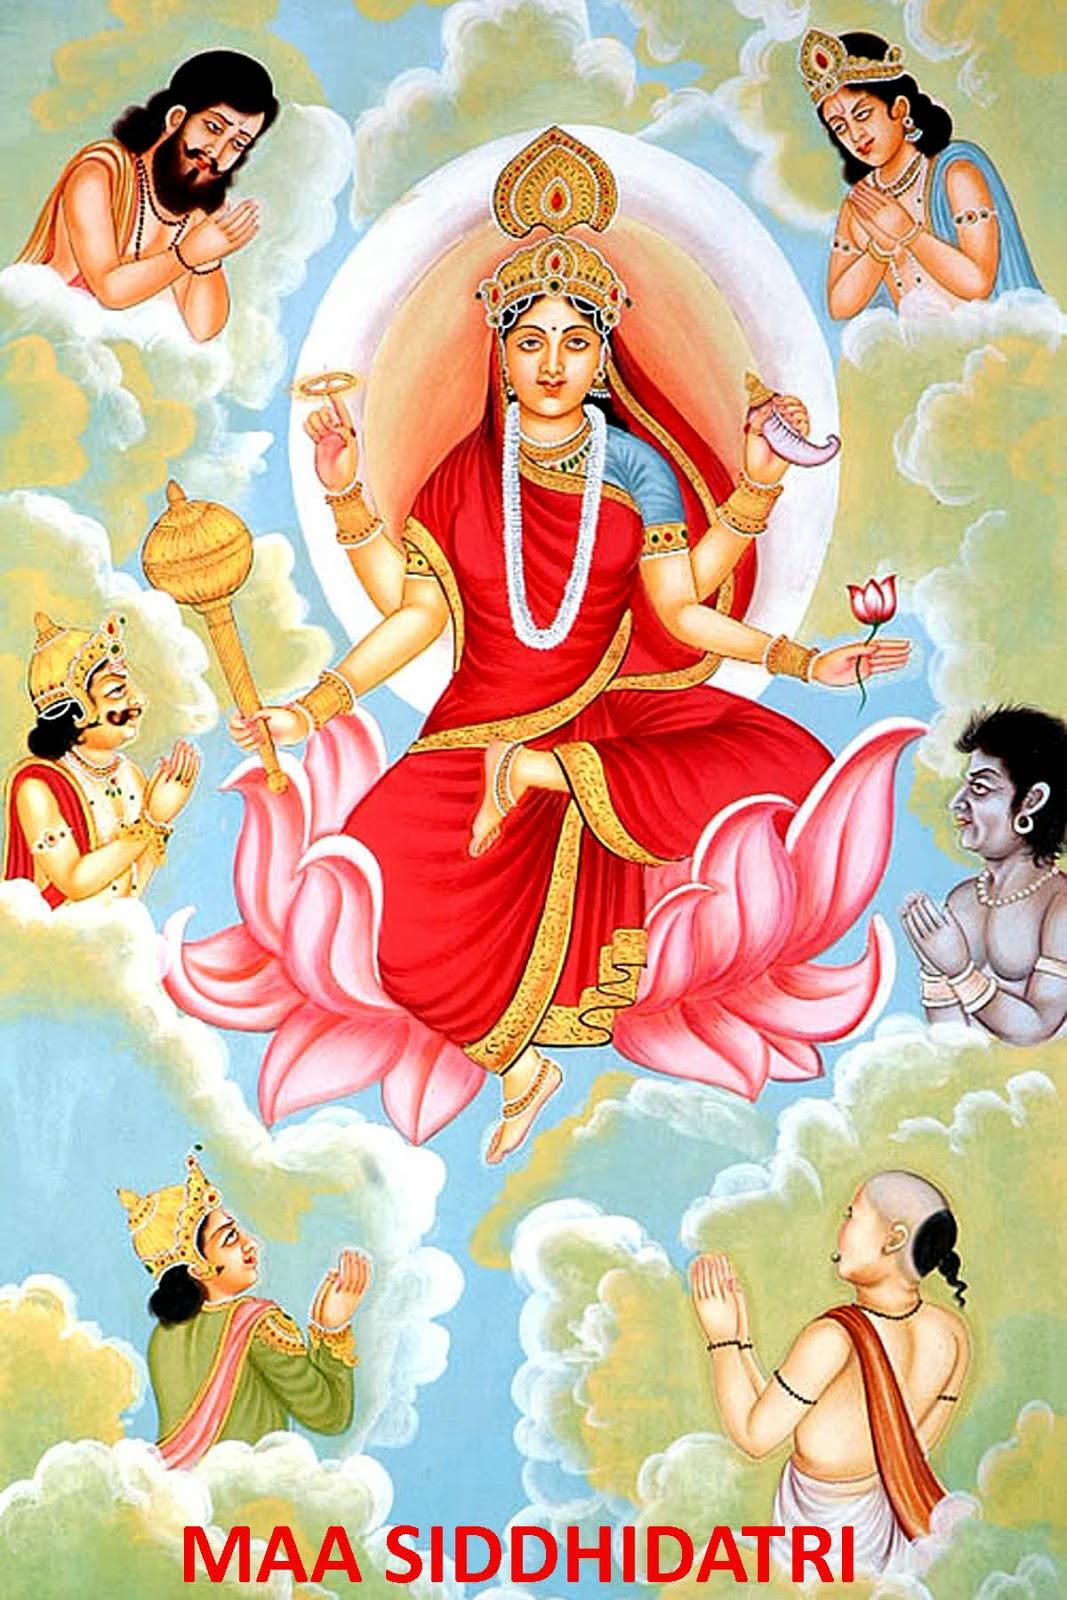 hindu_goddess_durga_devi_Mata_Siddhidatri_Ninth_Avatar_of_Maa_Durga_devi